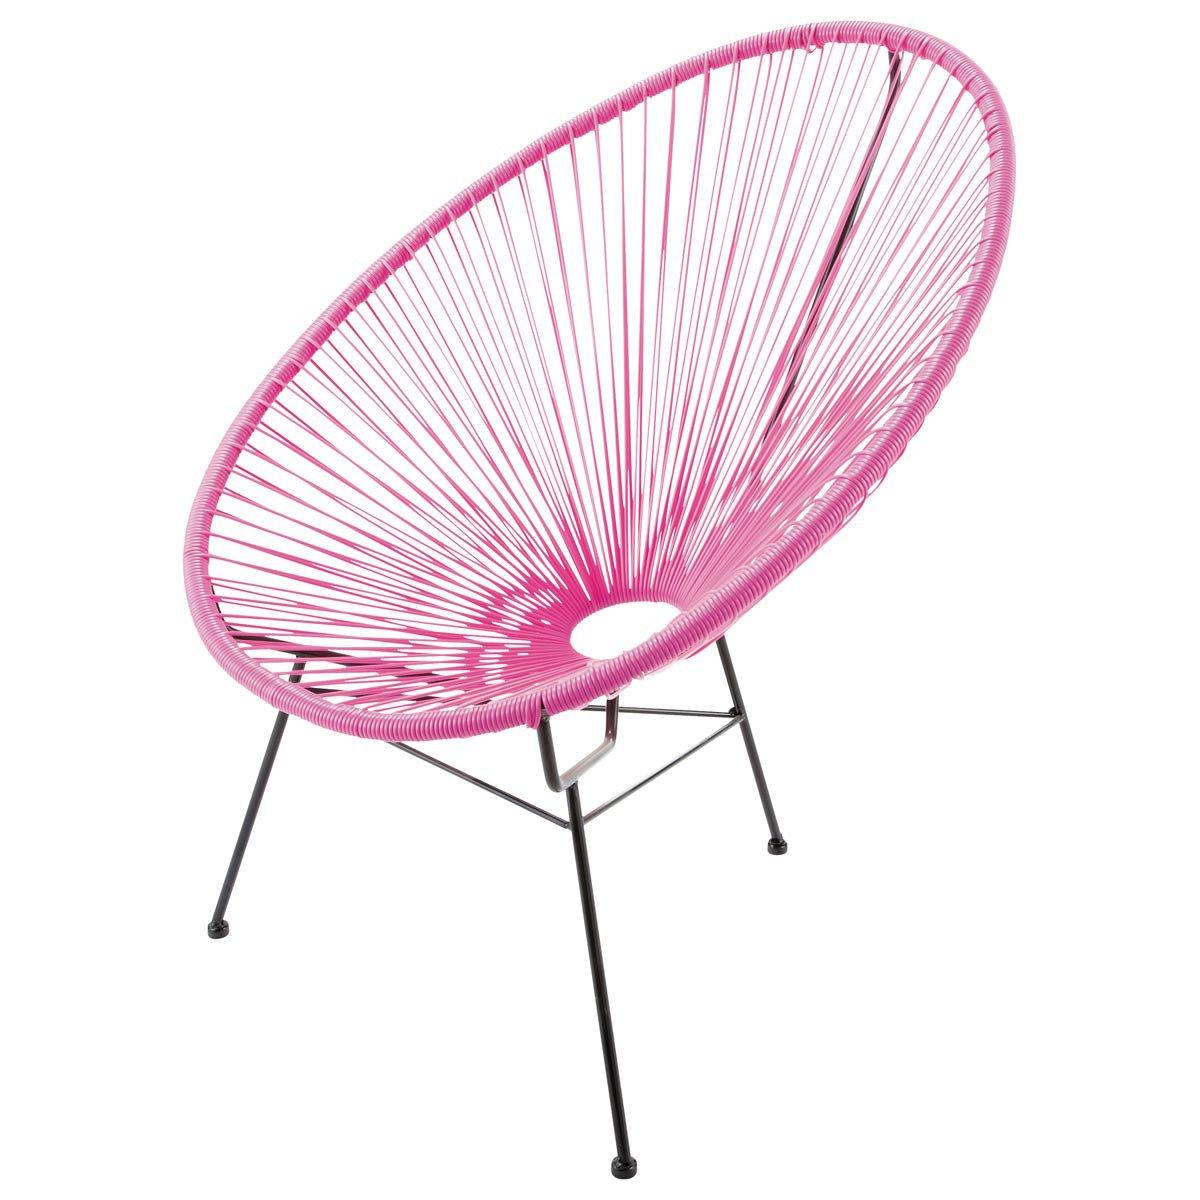 married with nothing copacabana una mecedora para todos. Black Bedroom Furniture Sets. Home Design Ideas